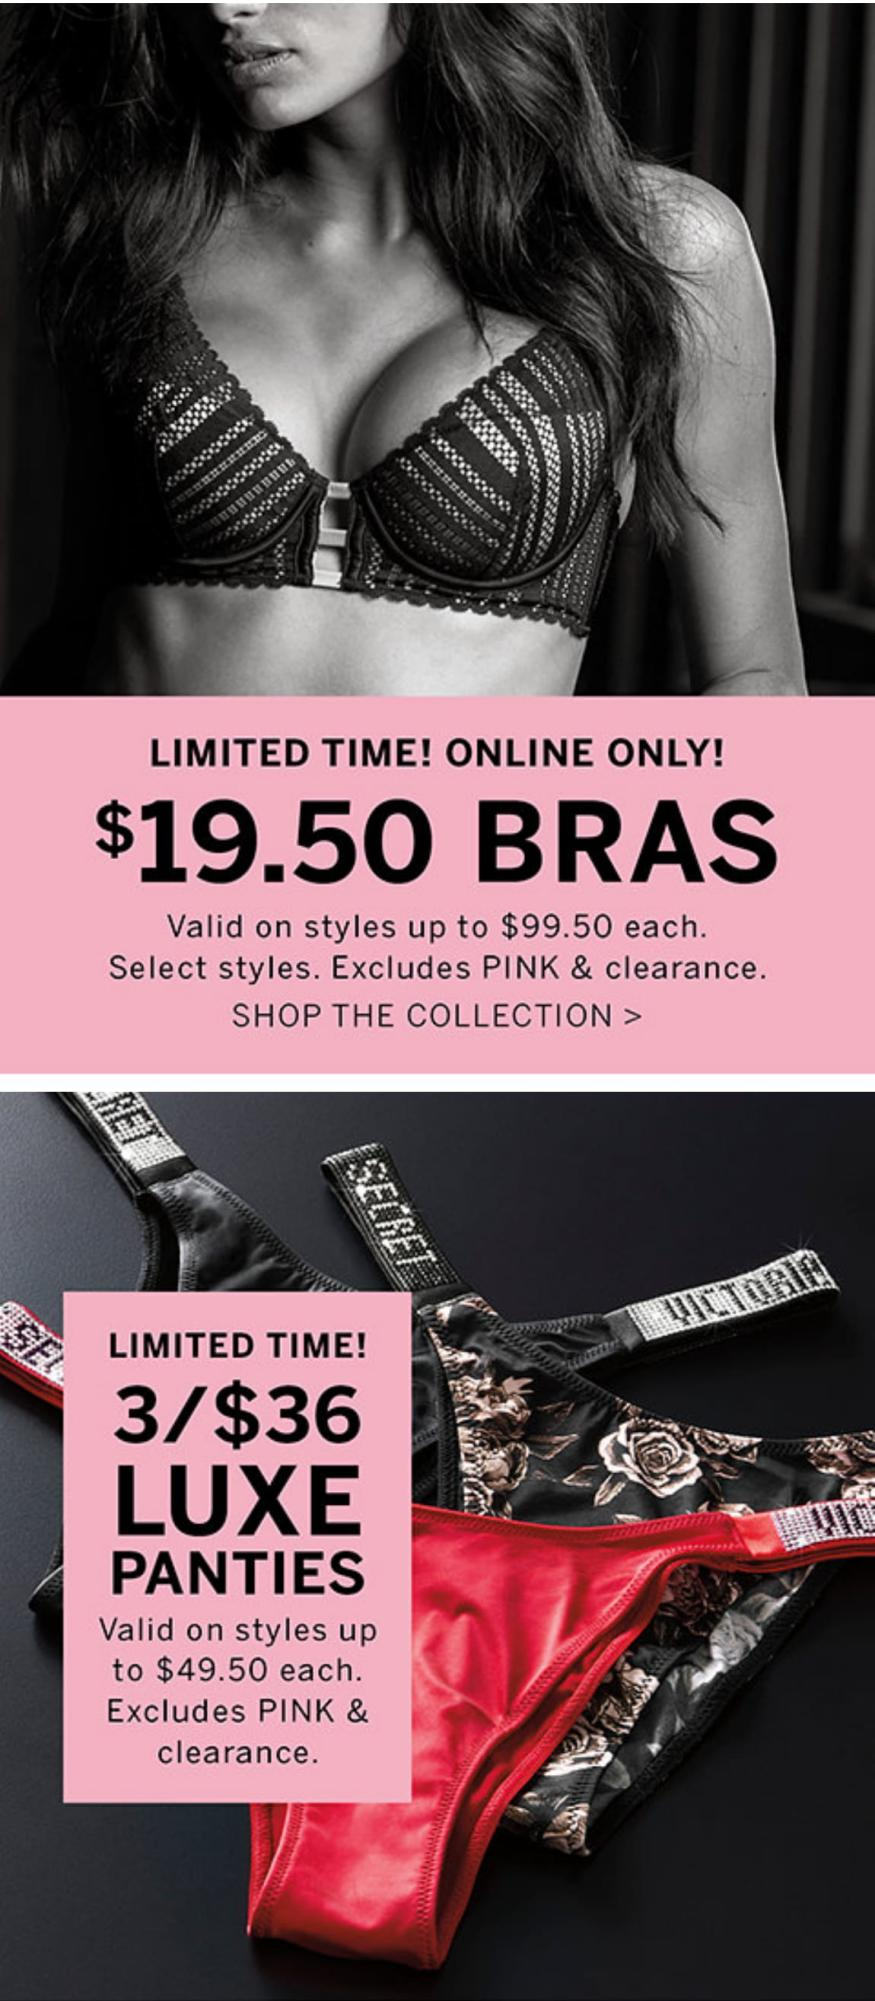 Victoria's Secret Cyber Monday 2019 Page 4